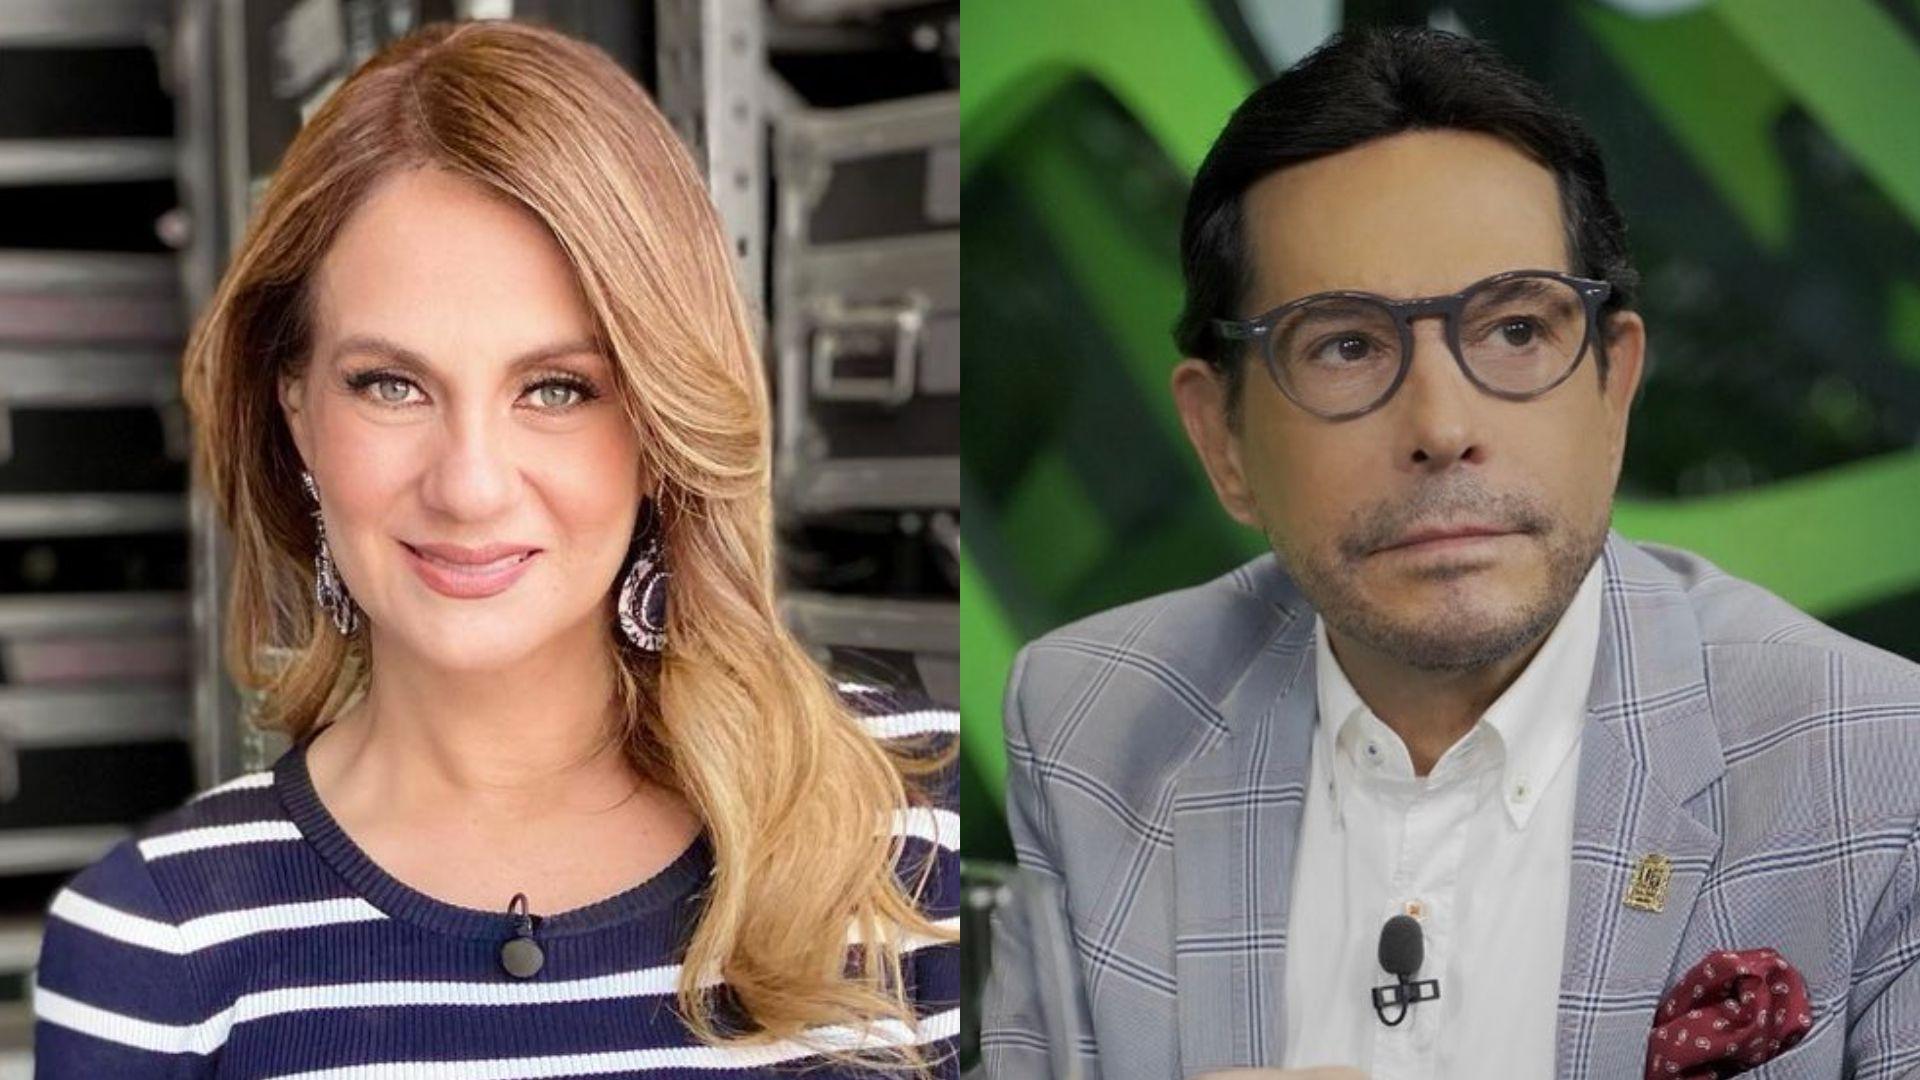 Flor Rubio y Juan José Origel (Foto: Instagram@florrubiooficial/@juanjoseorigel)